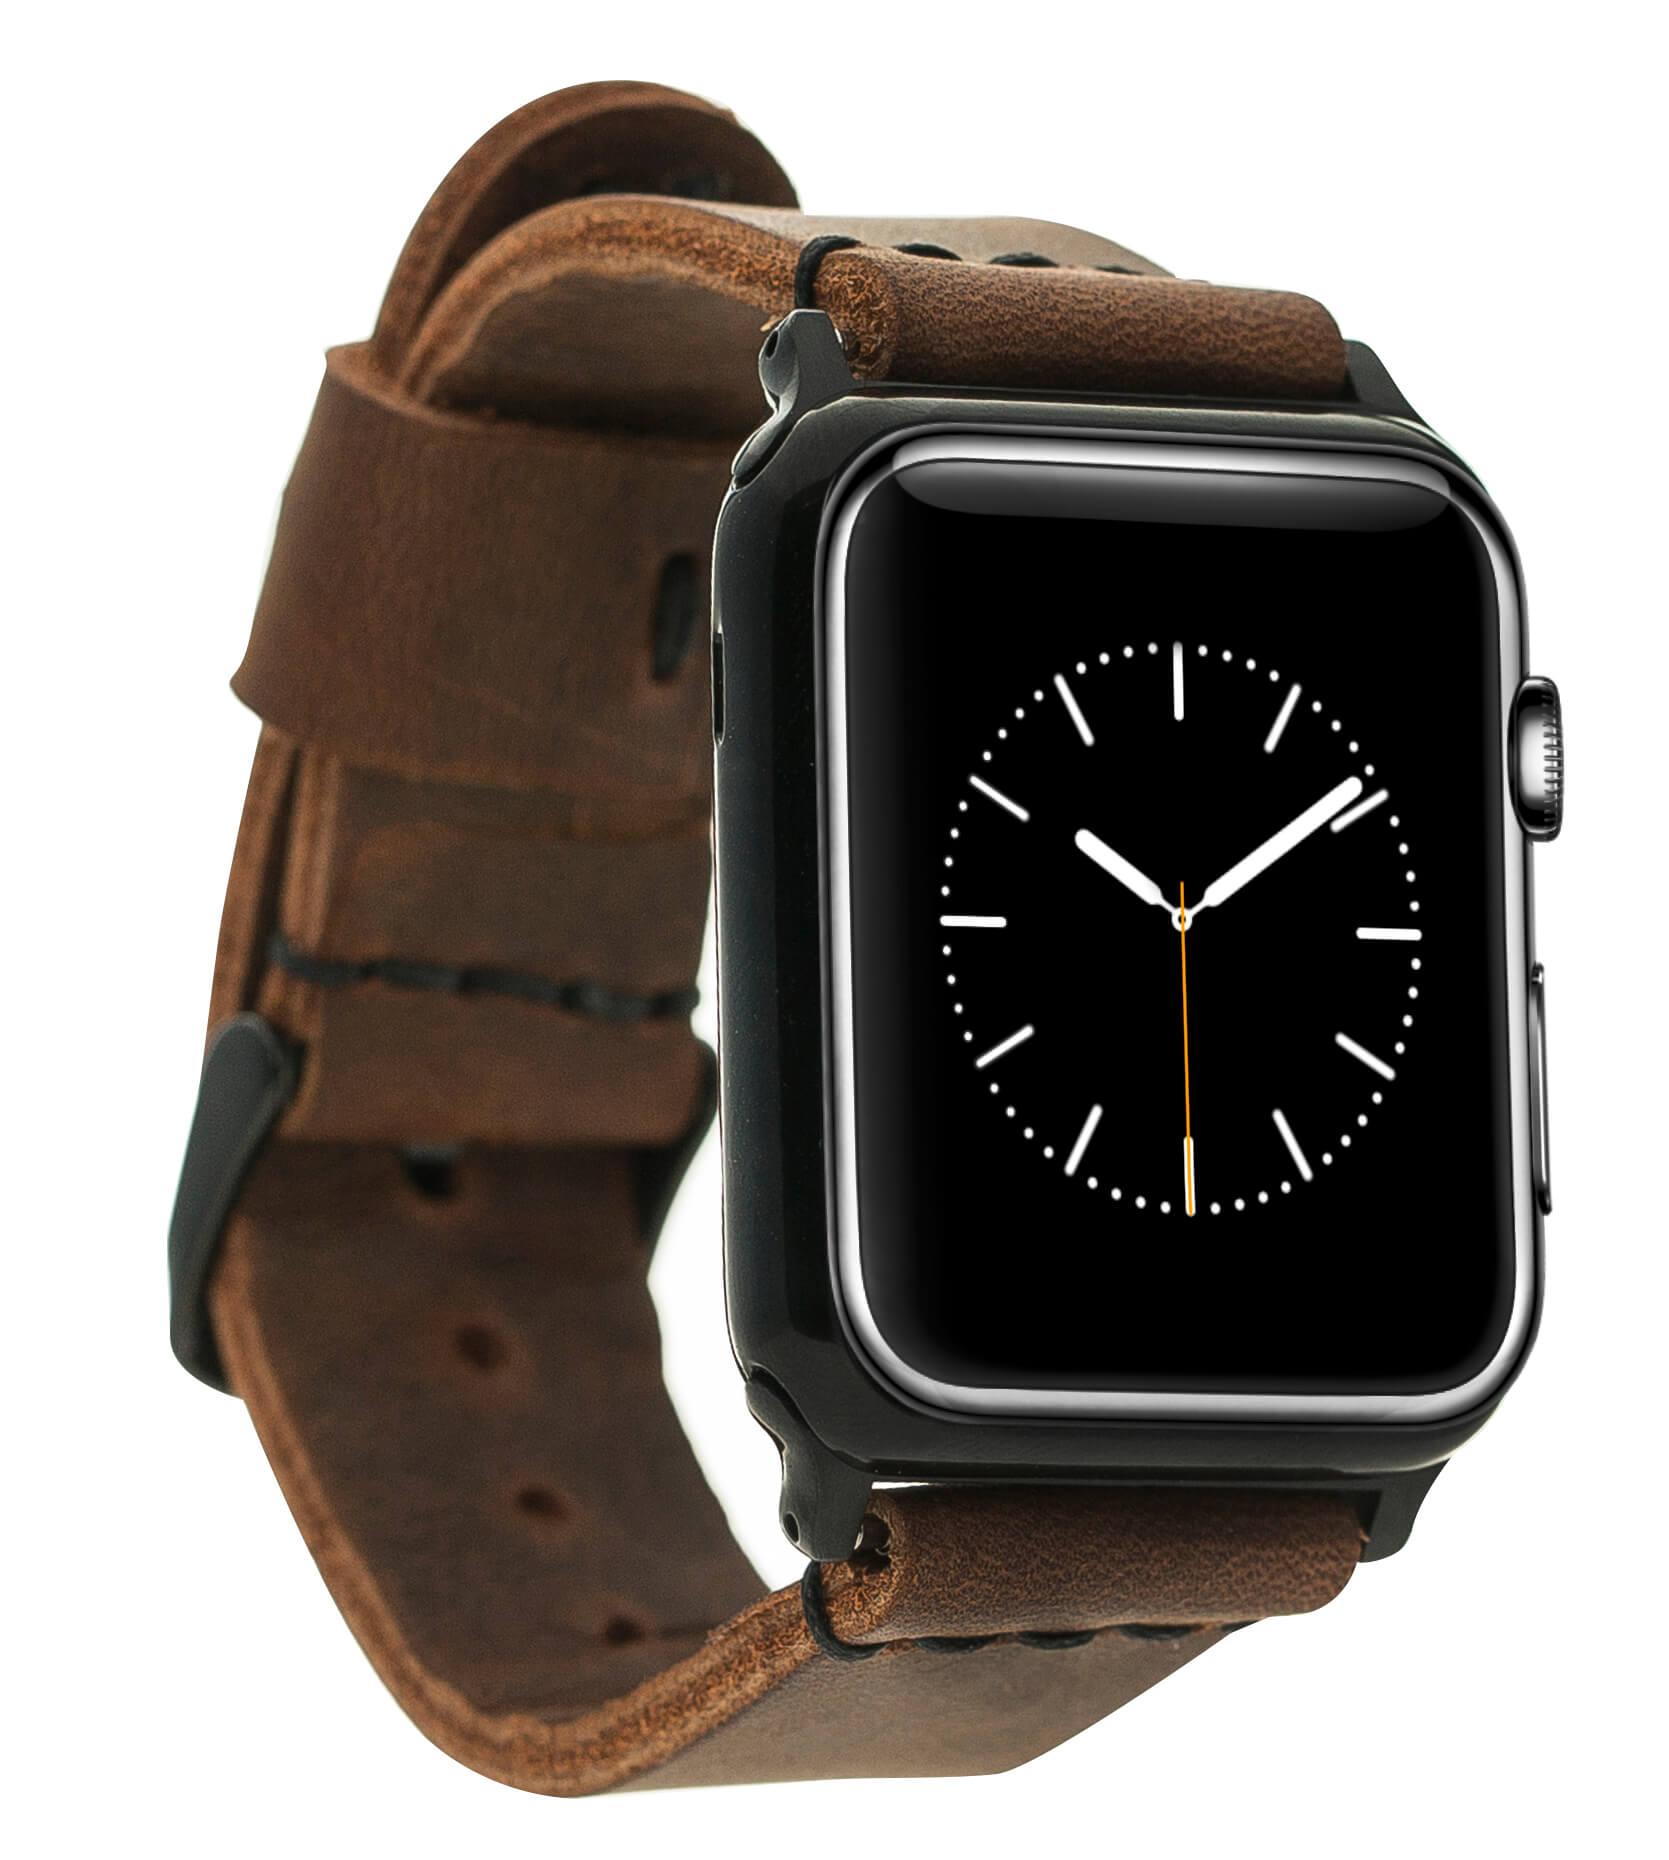 Armband aus echtem Leder für die Apple Watch Series 1 - 4 Leder Lederarmband 38mm /40 mm in Vintage Braun